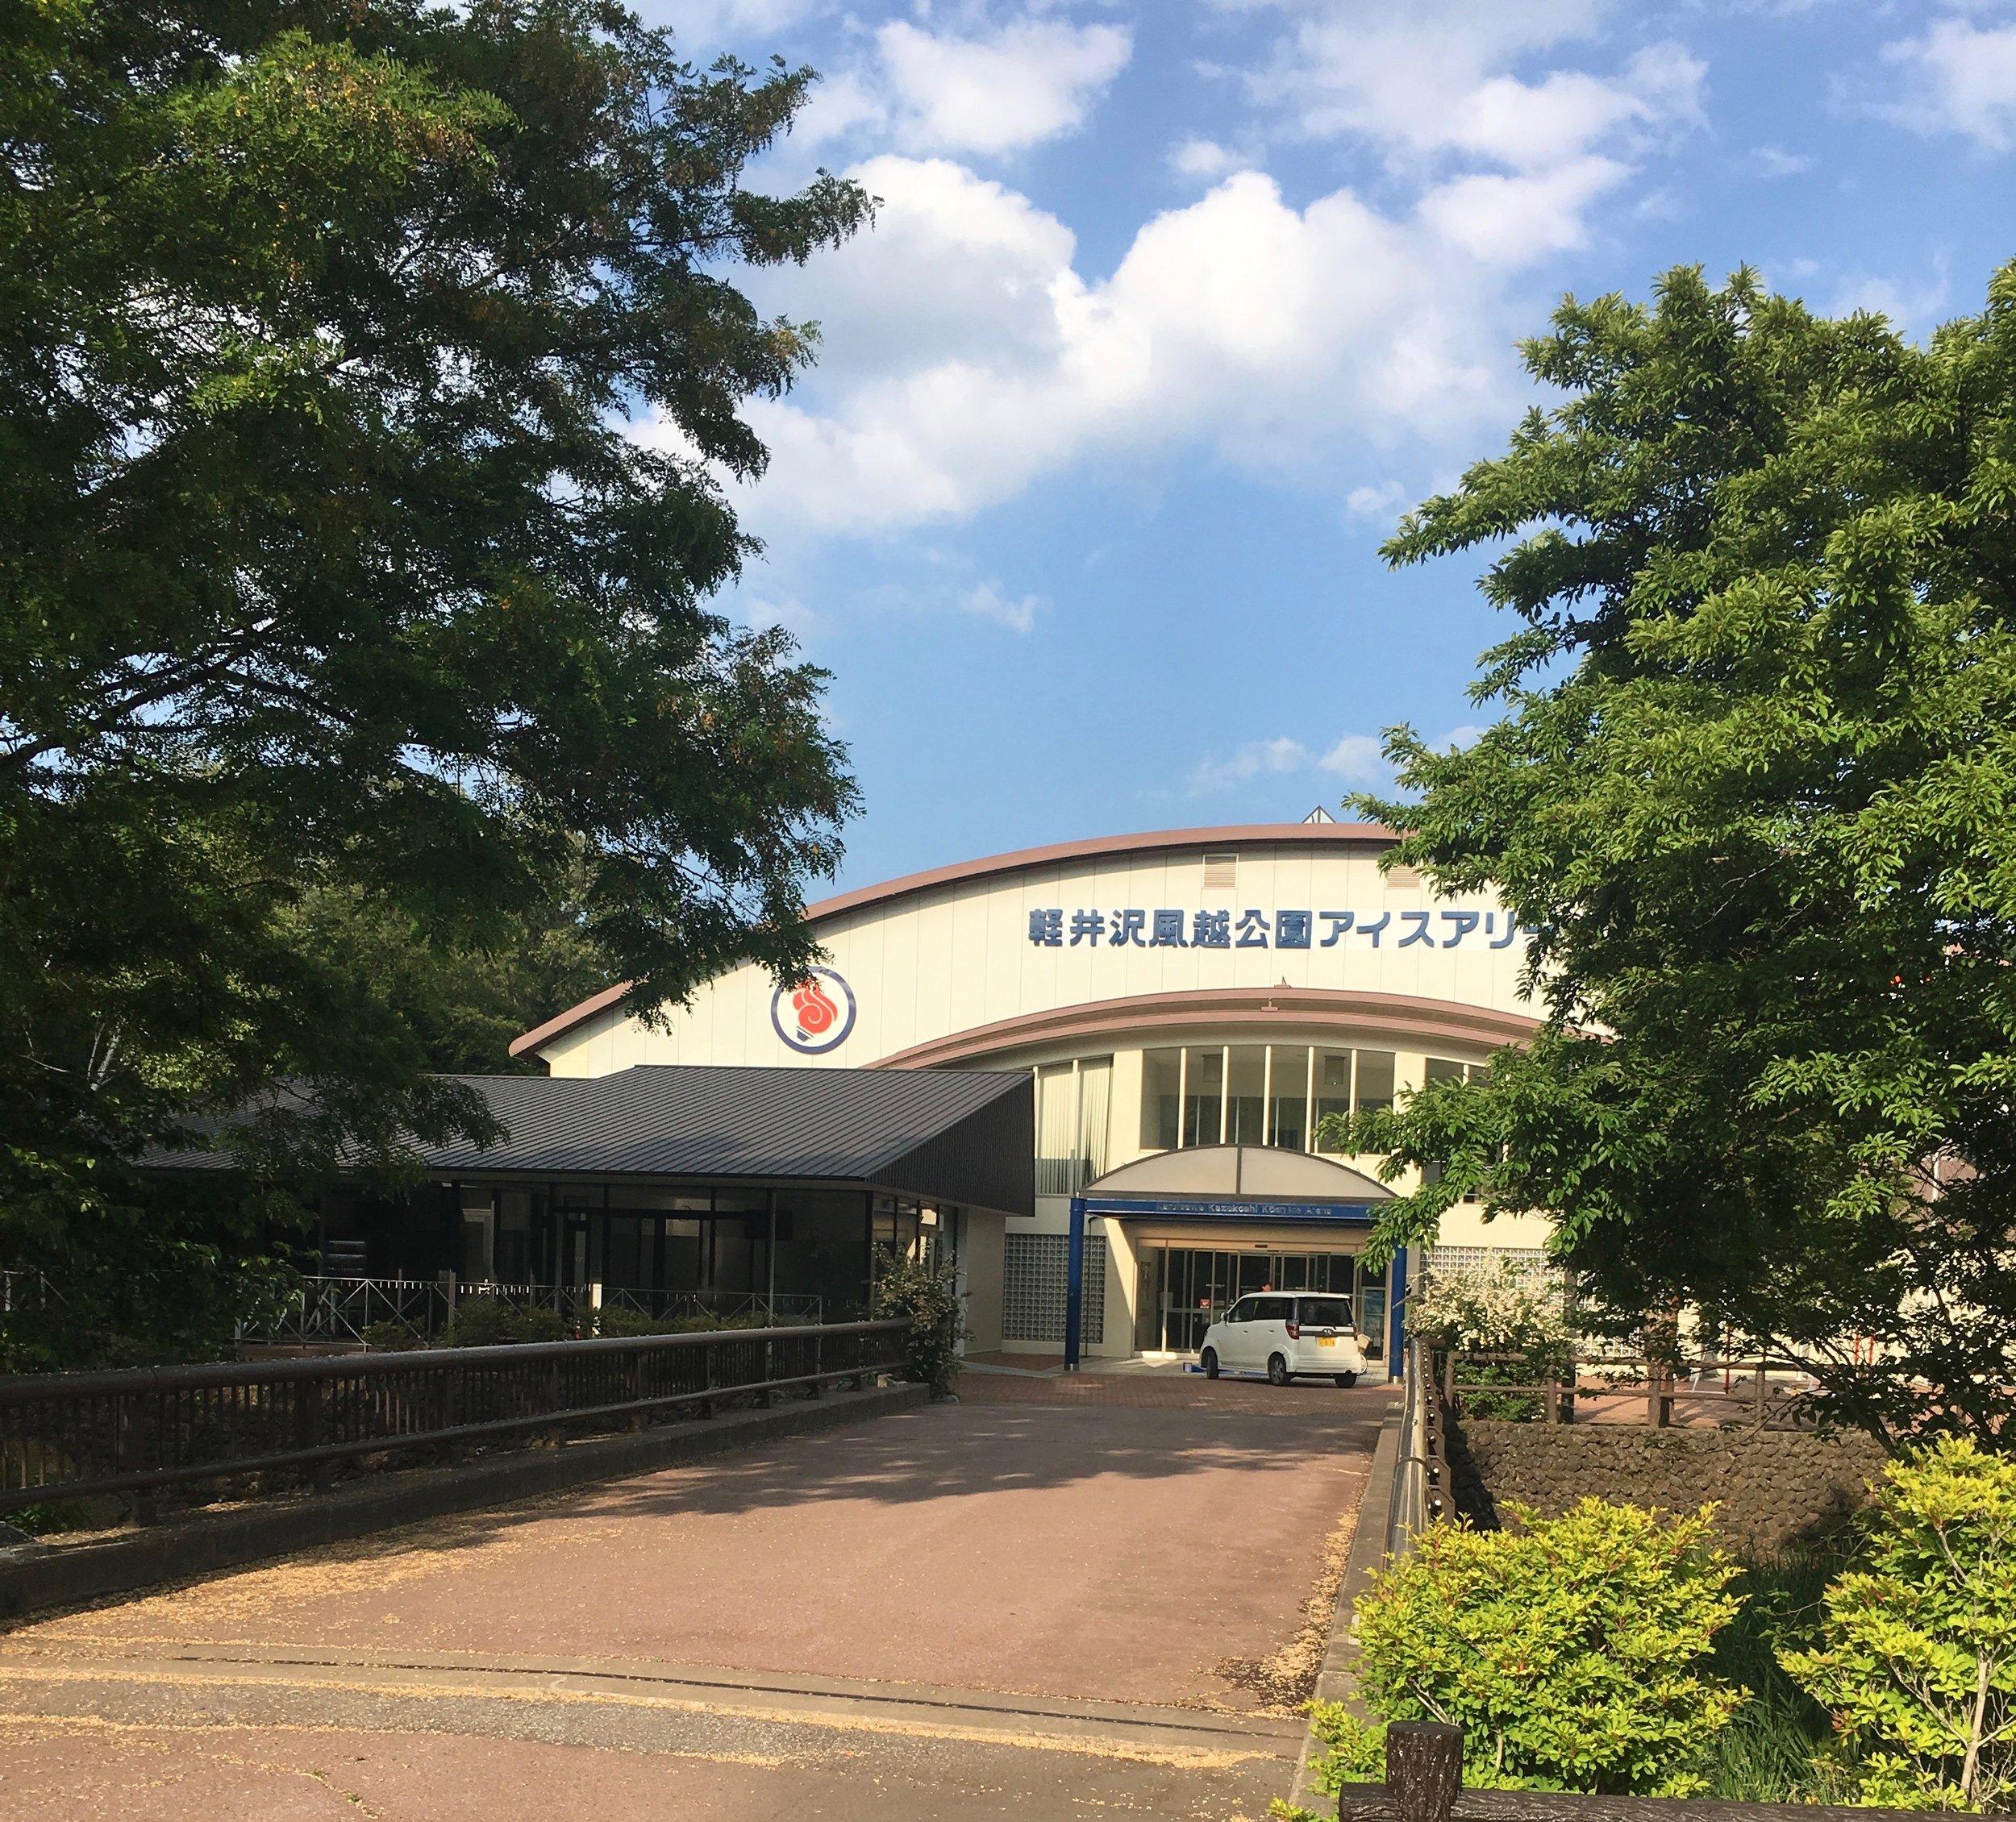 The ice rink where the Karuizawa Fairys play.